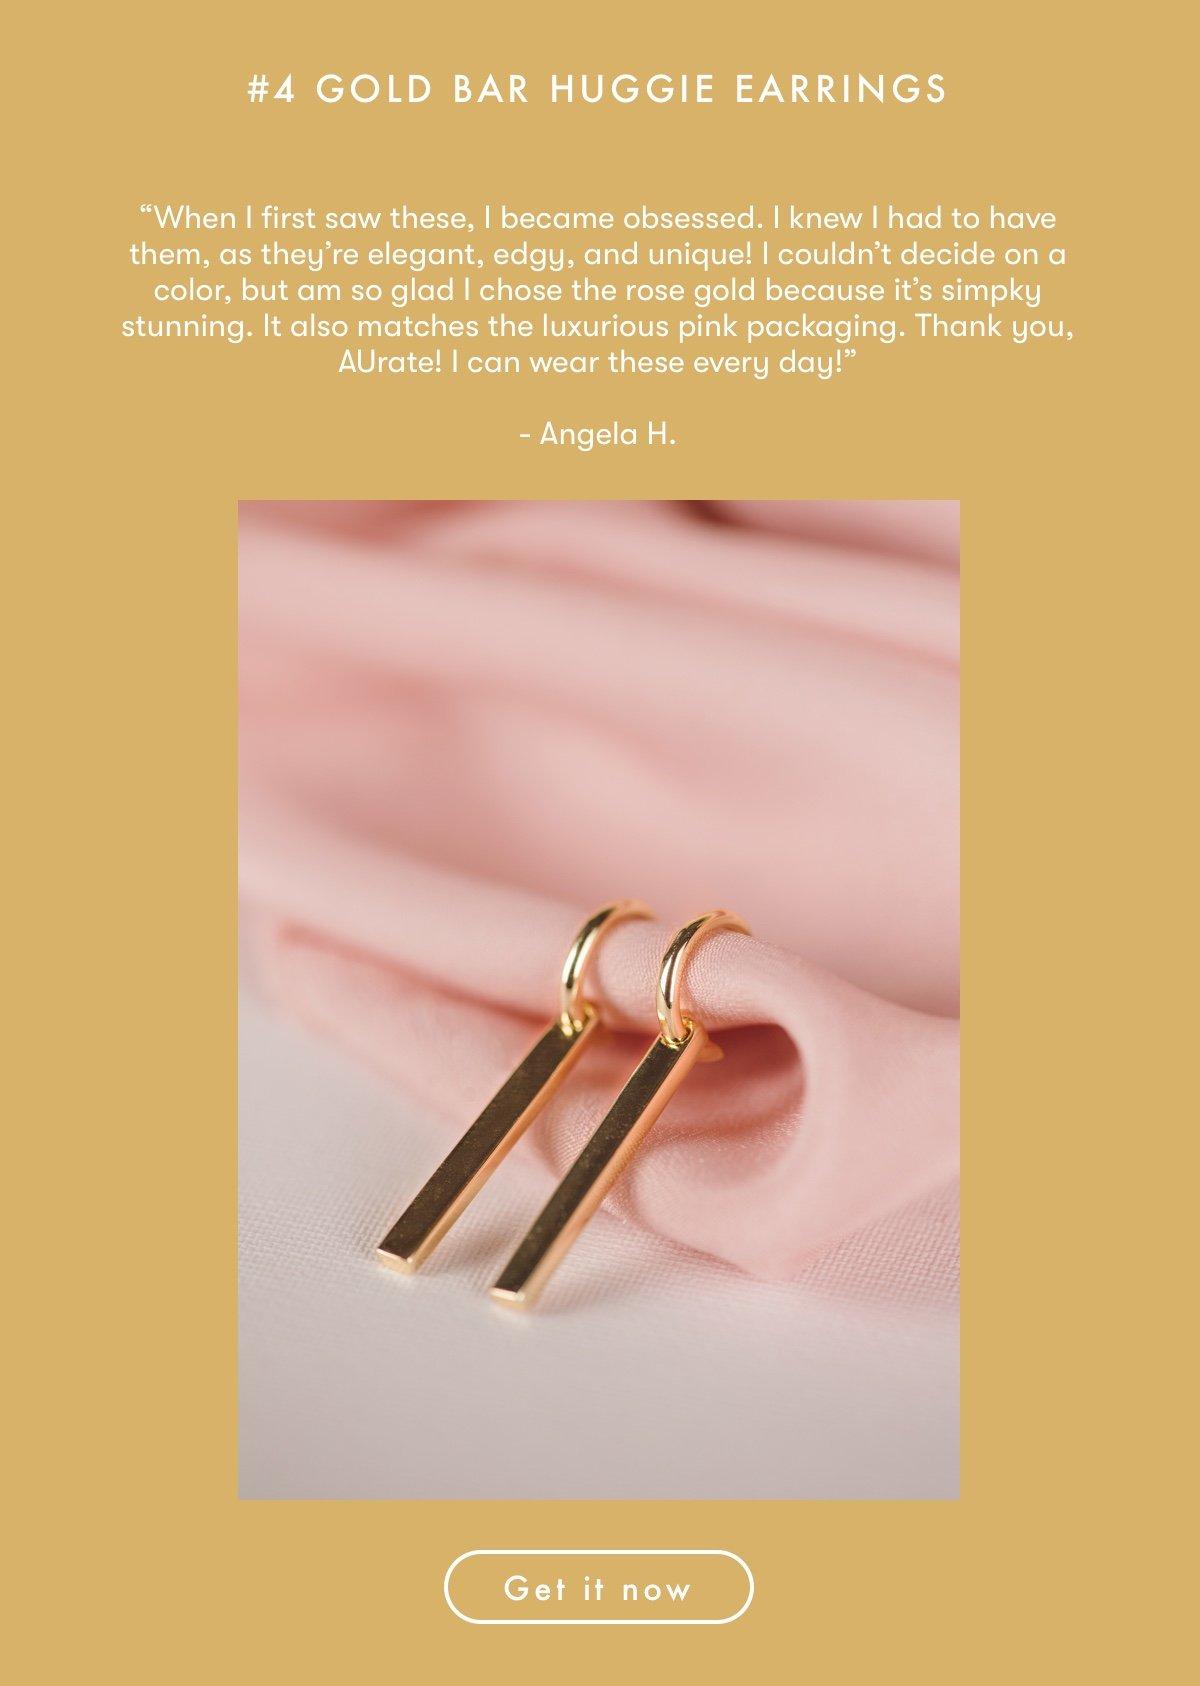 Gold Bar Huggie Earrings